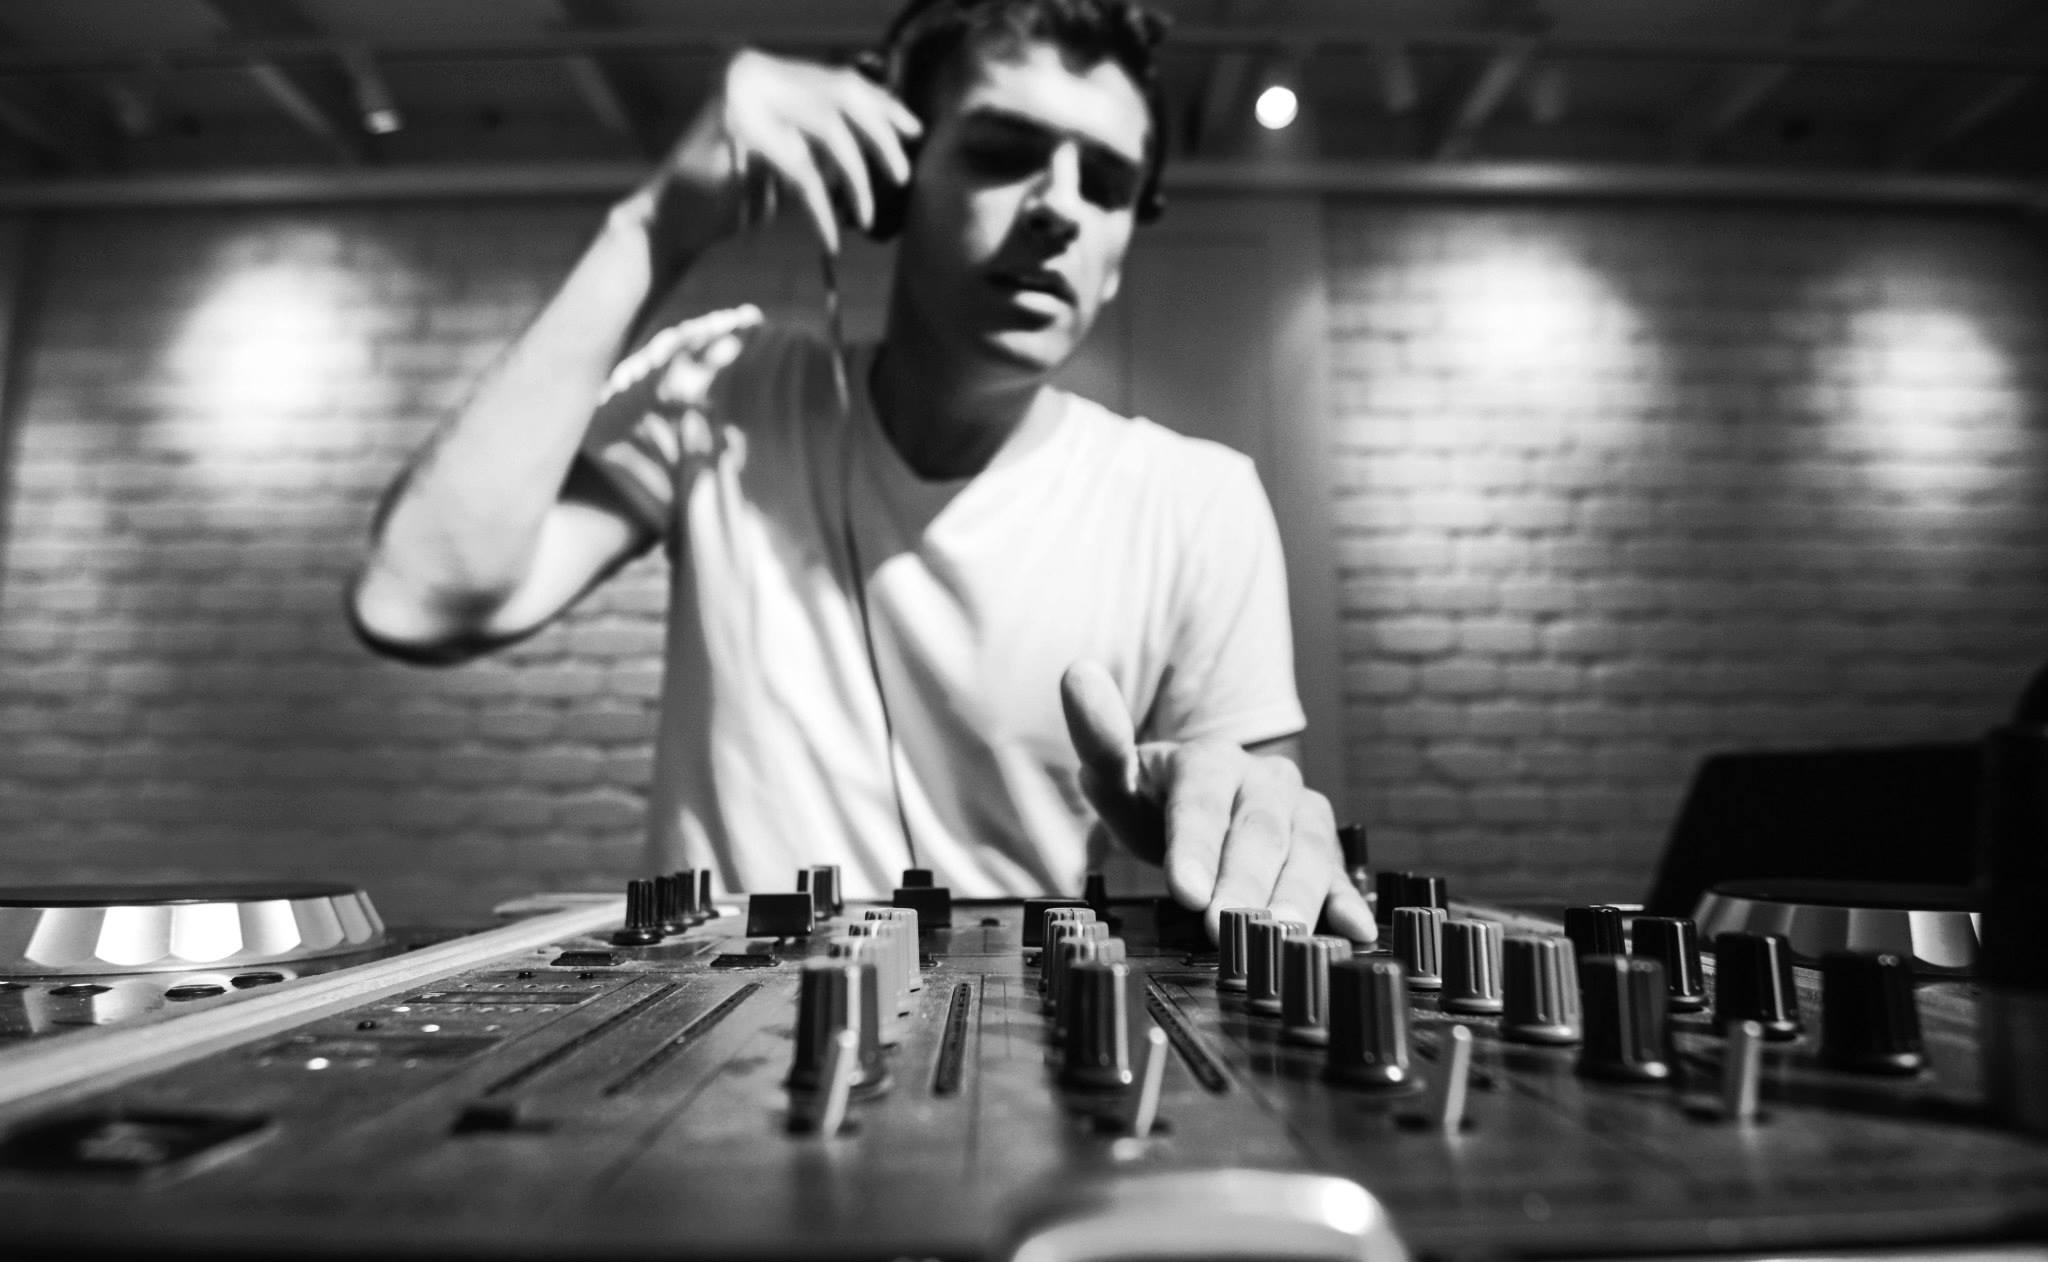 WedReviews - ברנע שירותי מוסיקה | Barnea Dj's